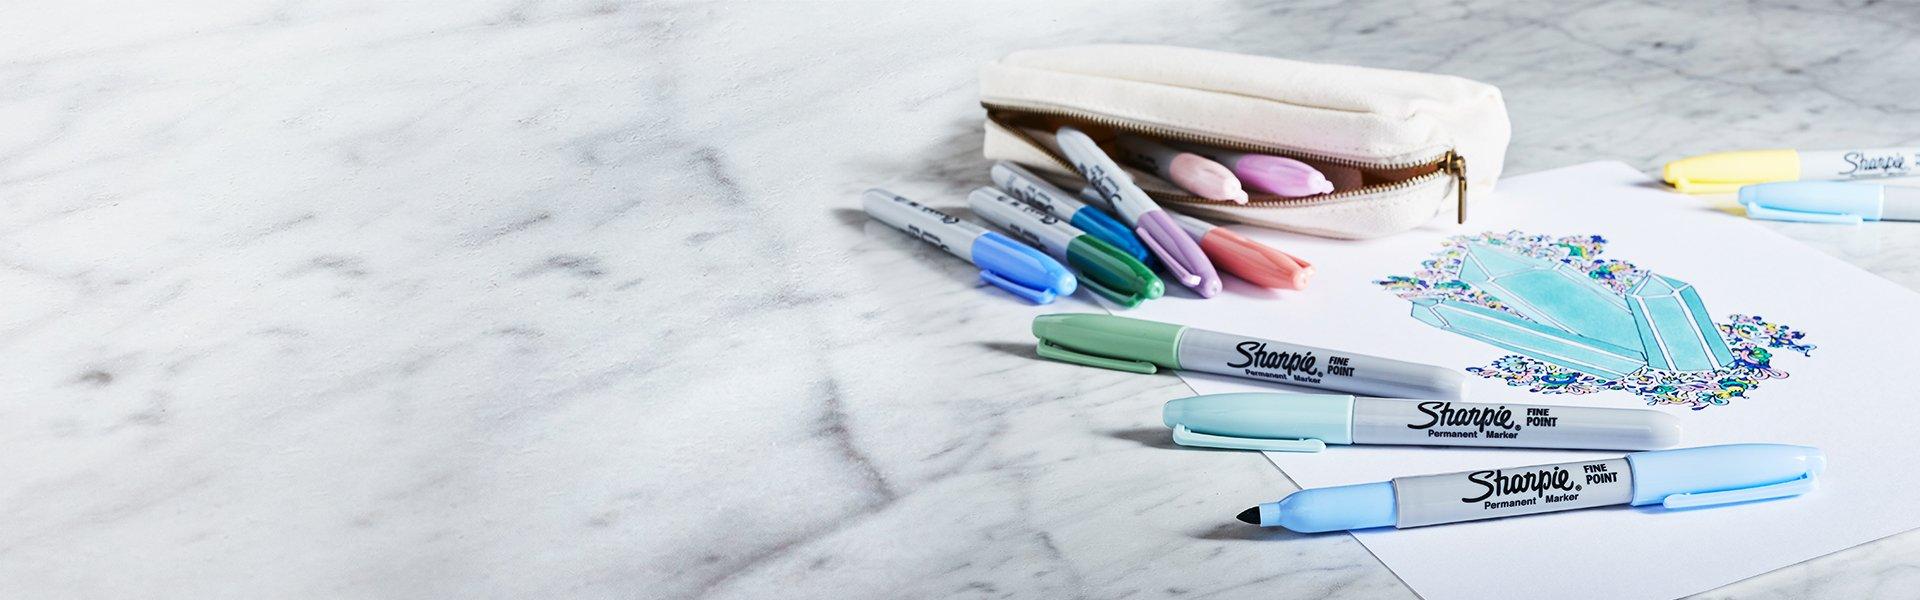 mystic sharpie permanent markers